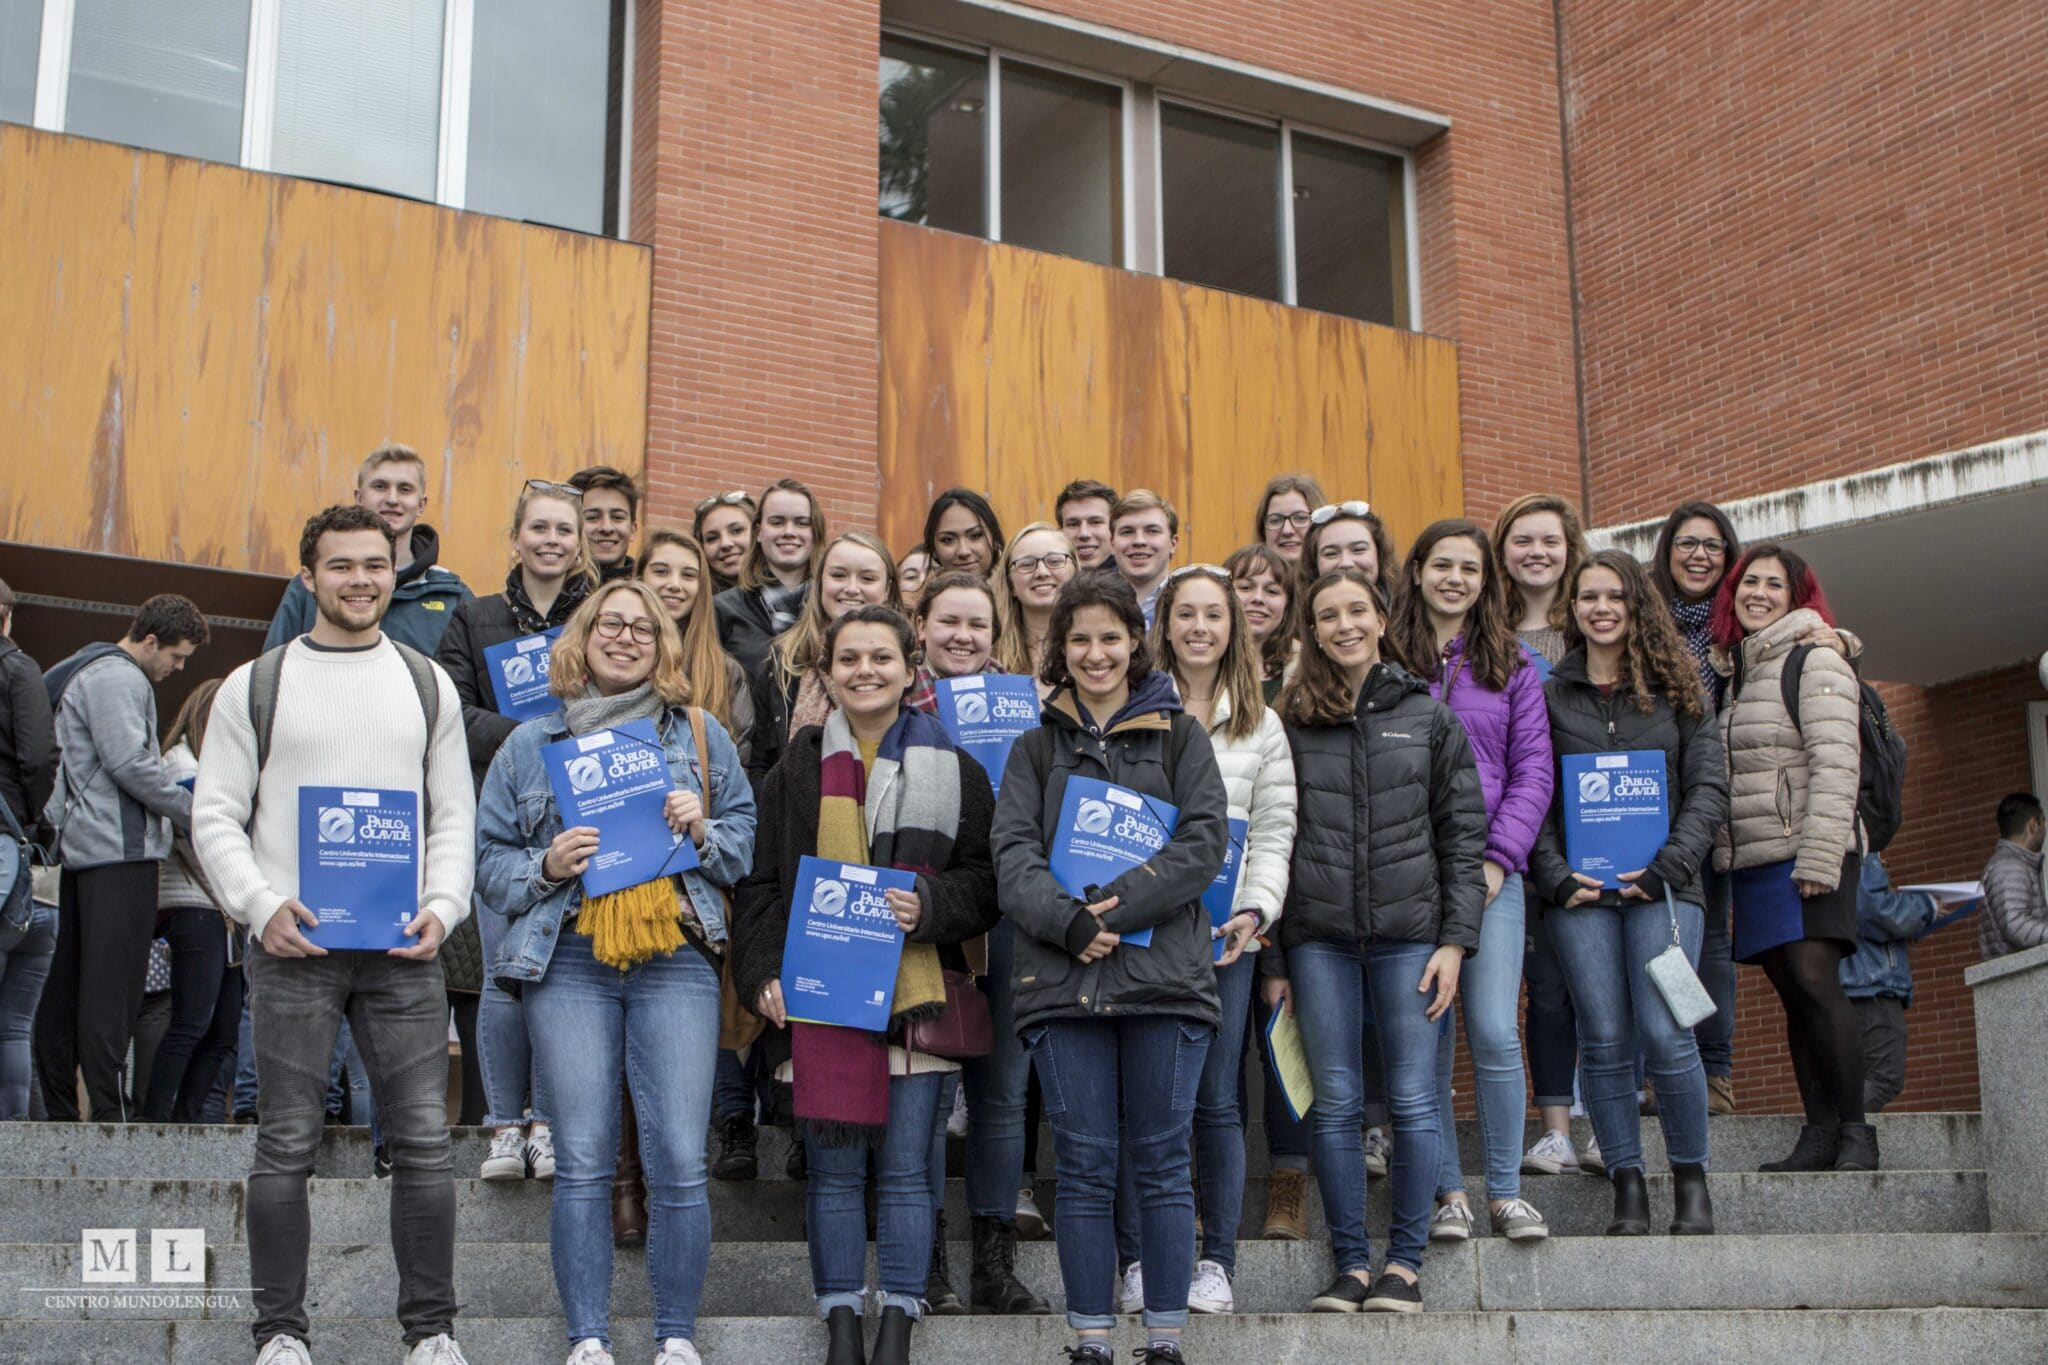 Custom semester program for college students -Study abroad program in Pablo de Olavide university